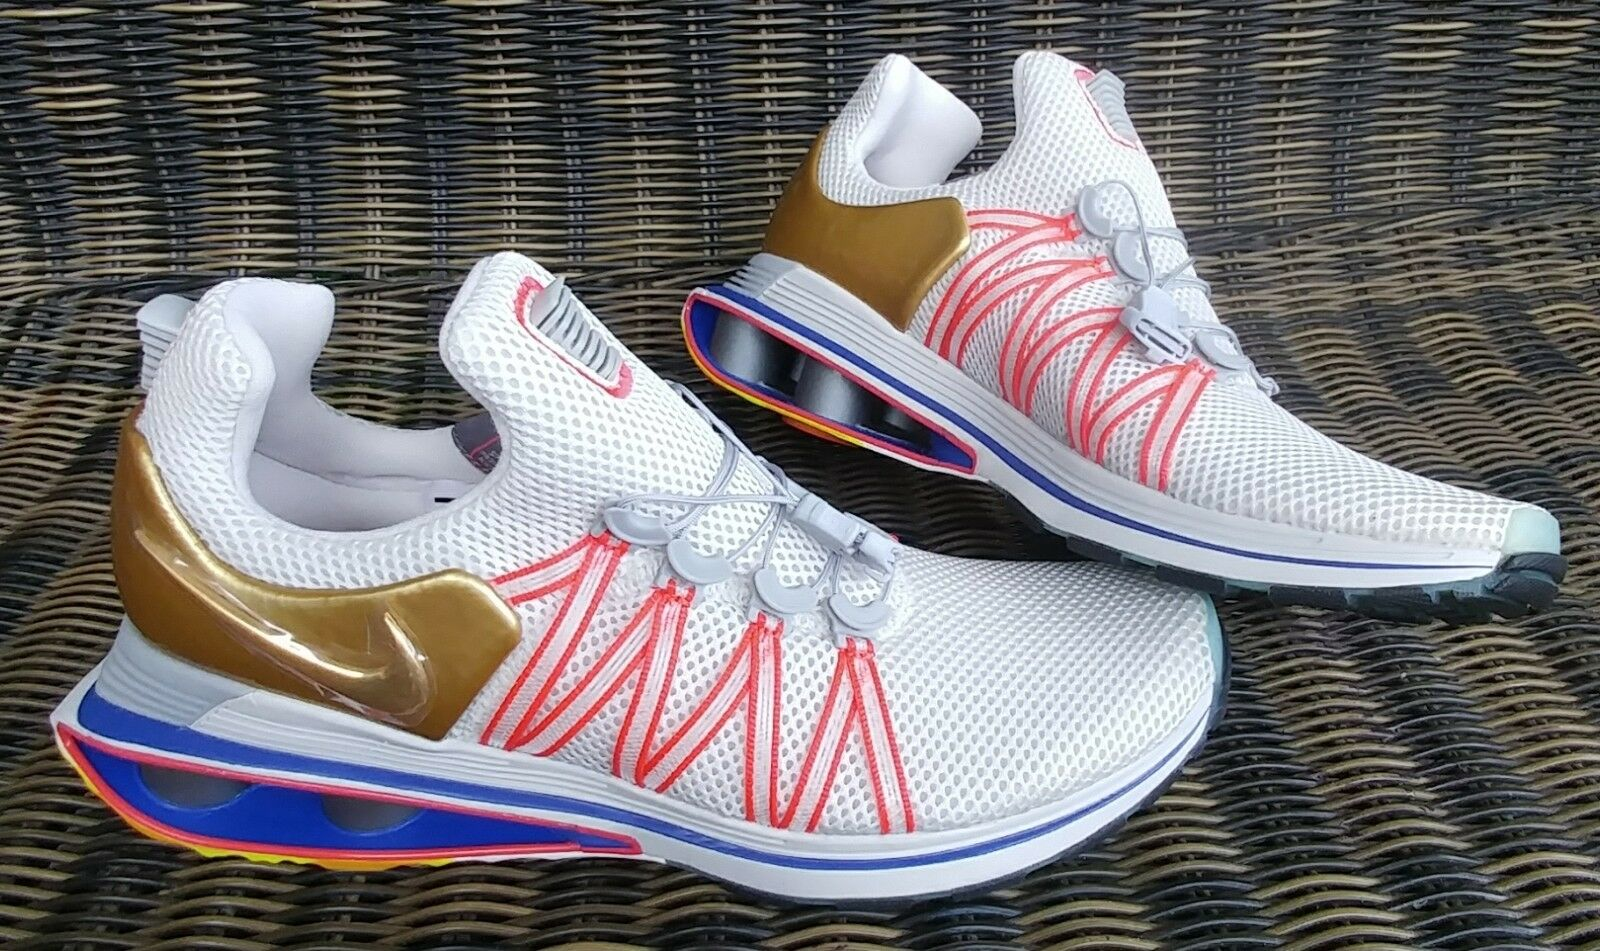 Nike Shox Gravity Mens 10.5 'Metallic gold' 2018 Sneakers